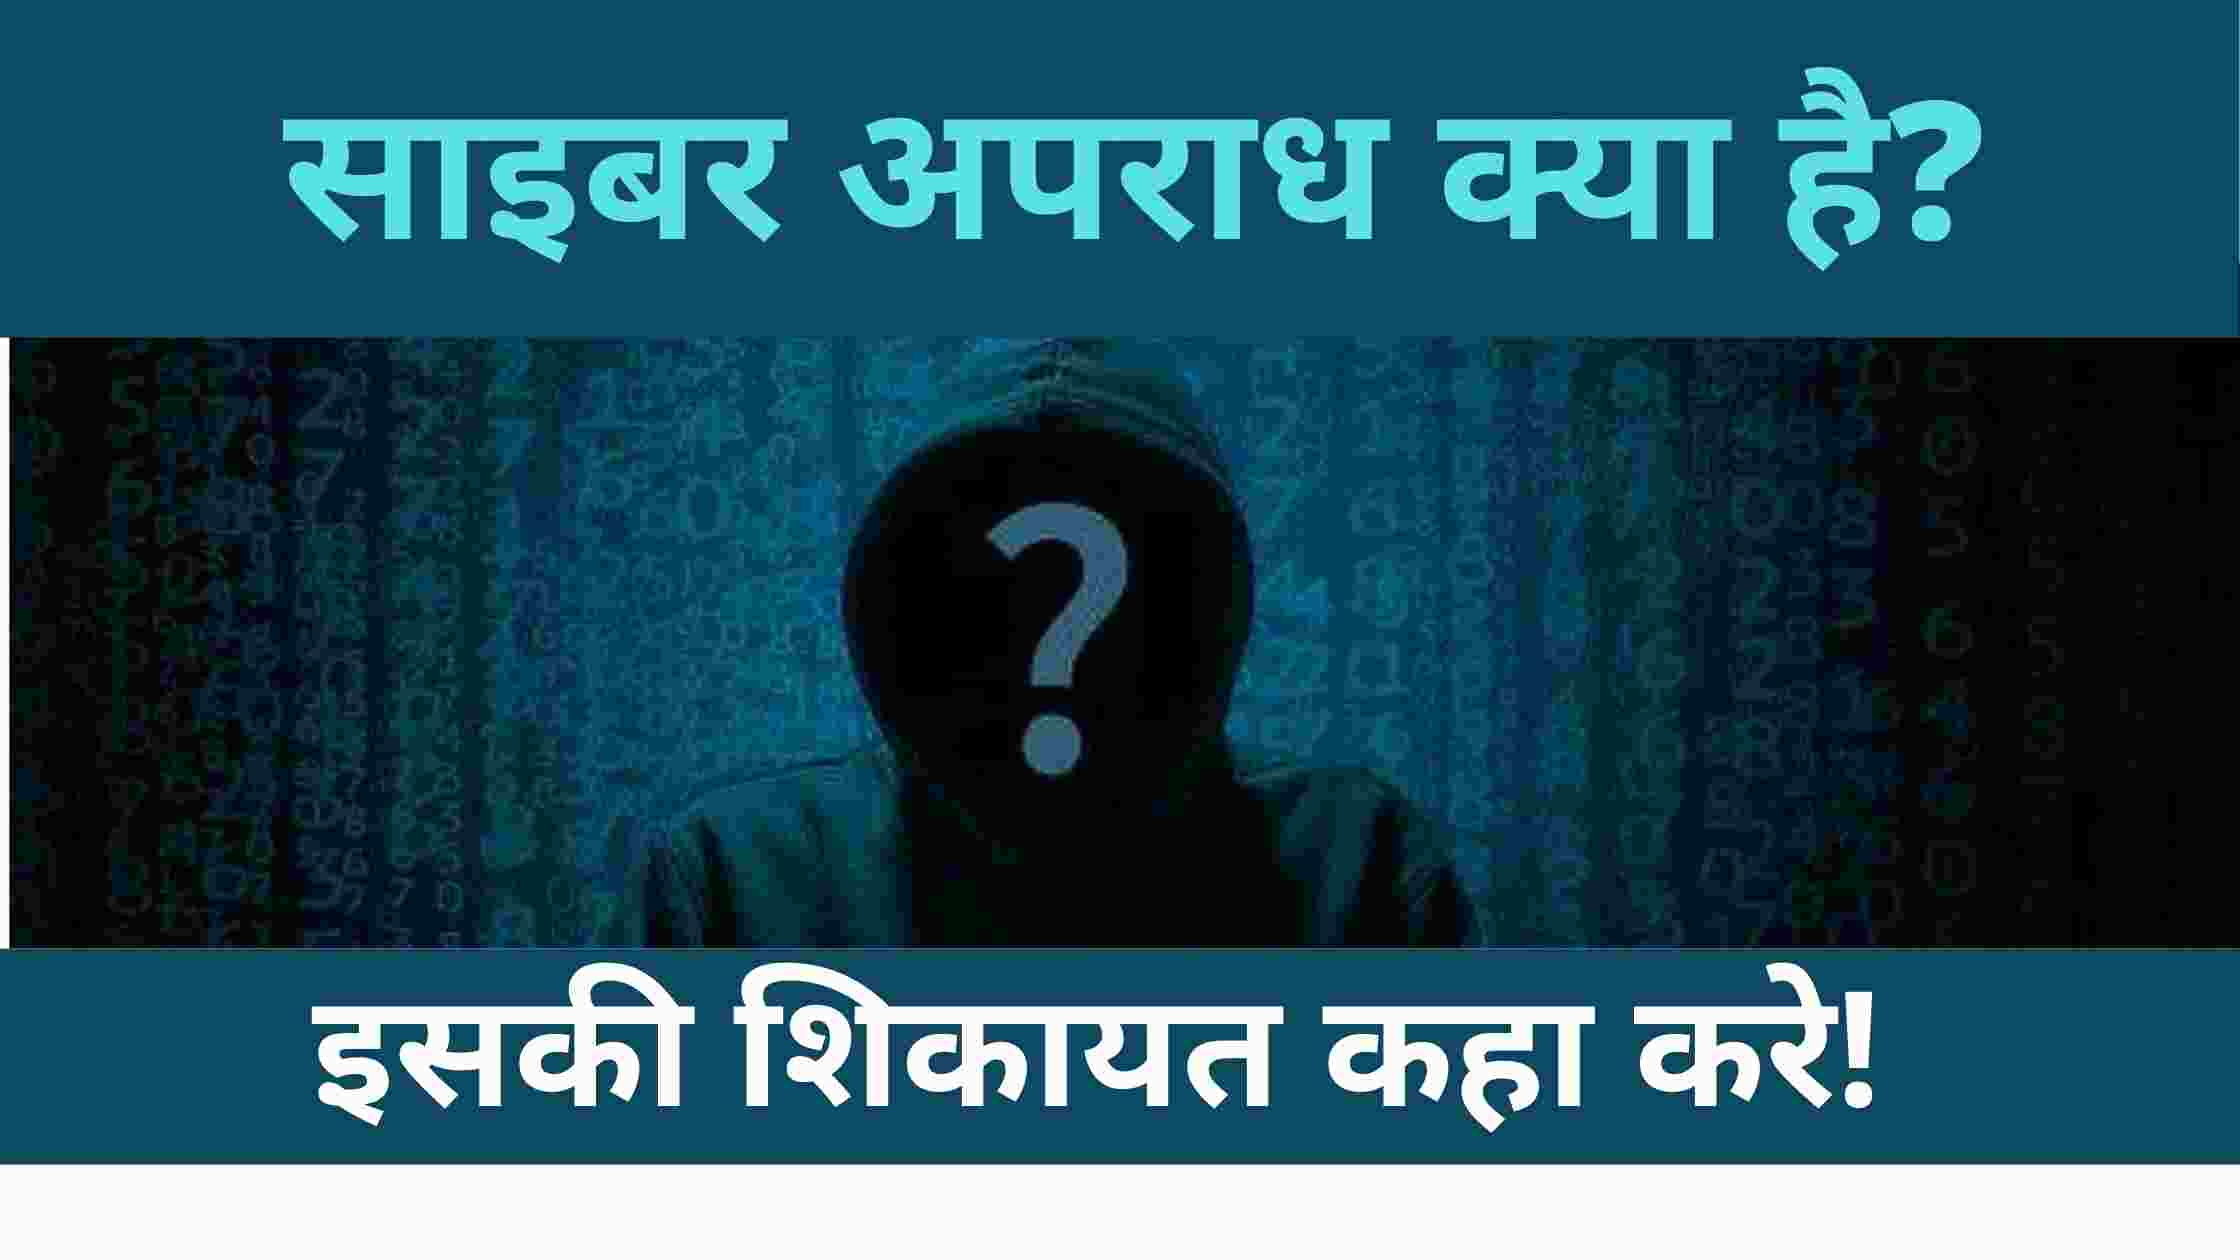 cyber-apradh-kya-hai